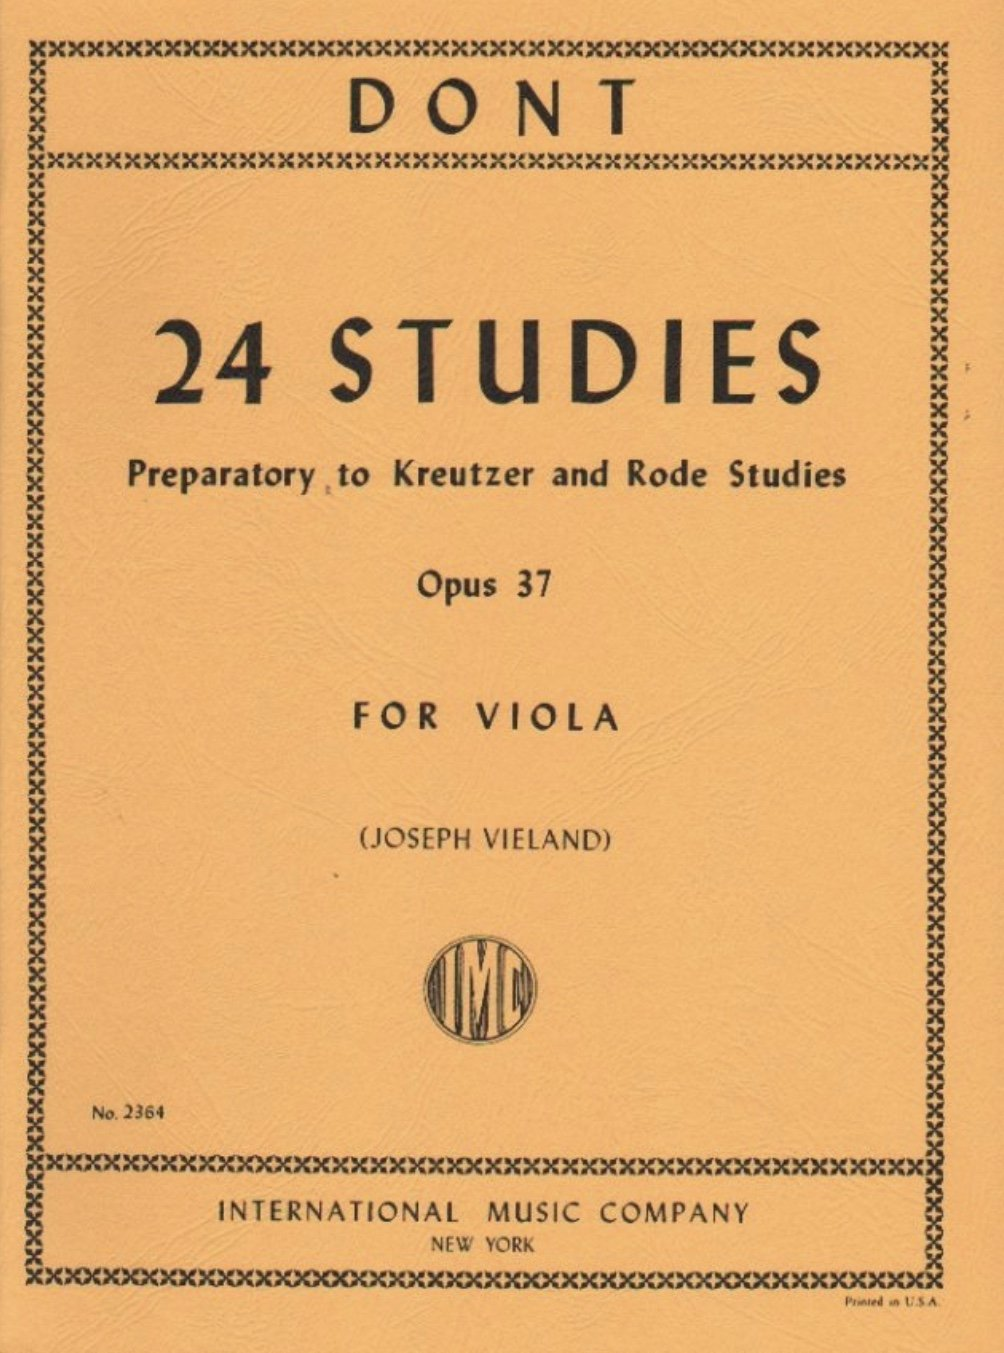 24 Studies Op 37 - Dont - Viola - Vieland - International